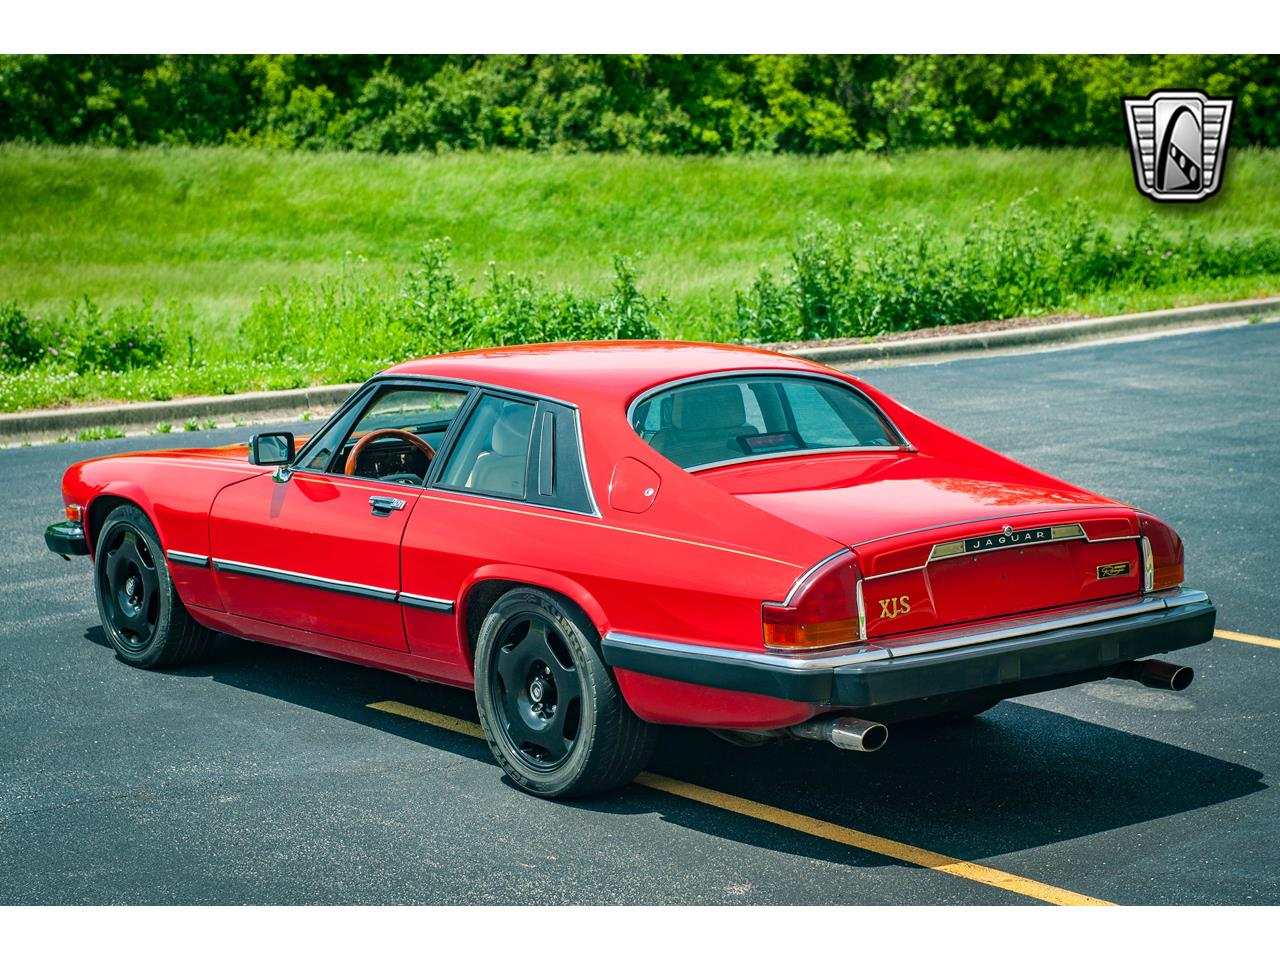 Large Picture of 1989 XJS located in O'Fallon Illinois - $20,000.00 - QB9L